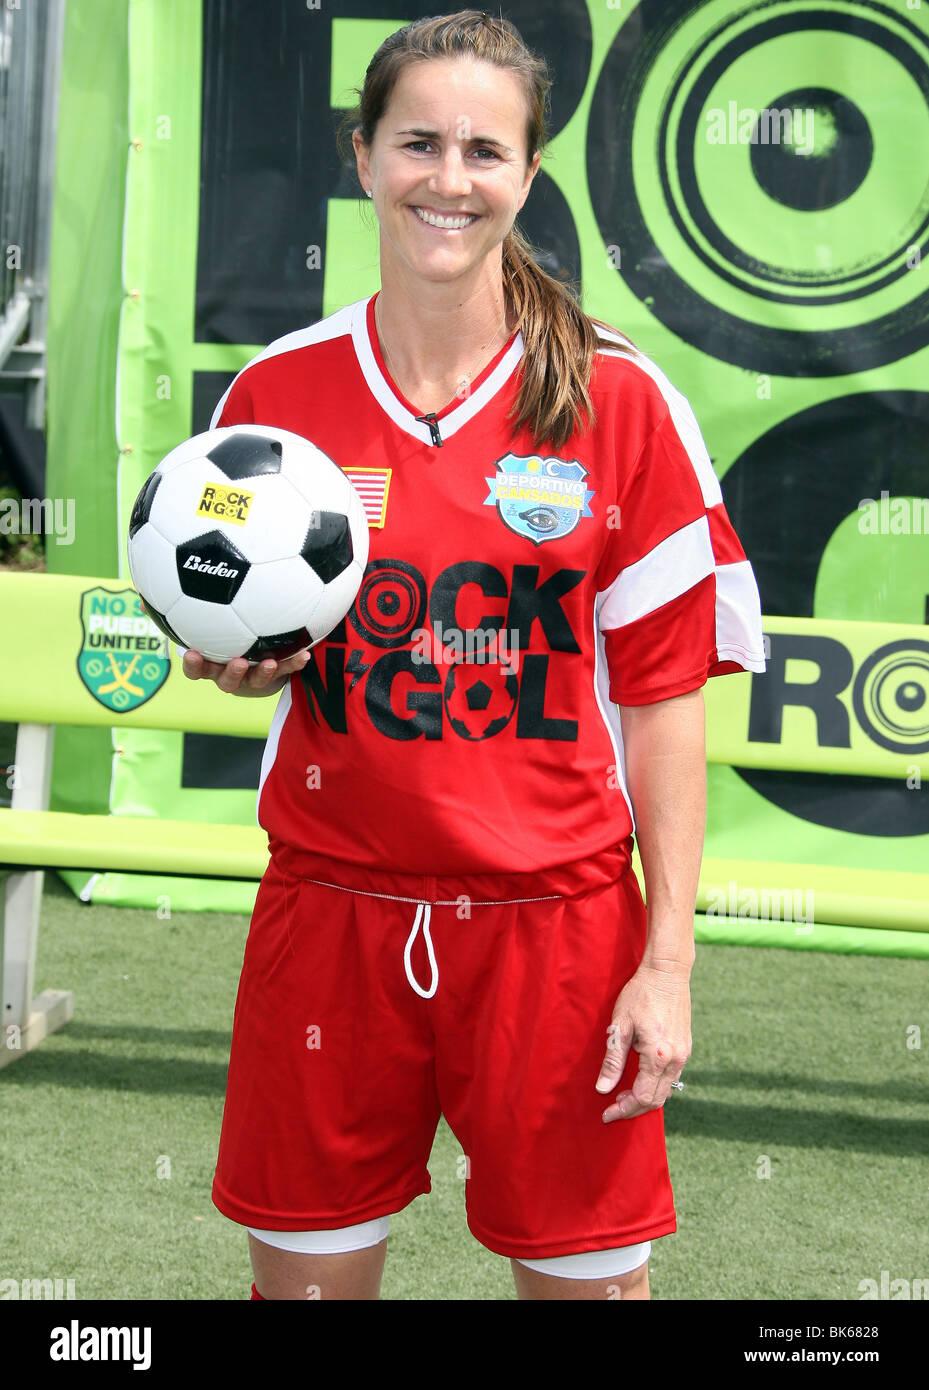 SANDY: Brandi chastain soccer ball